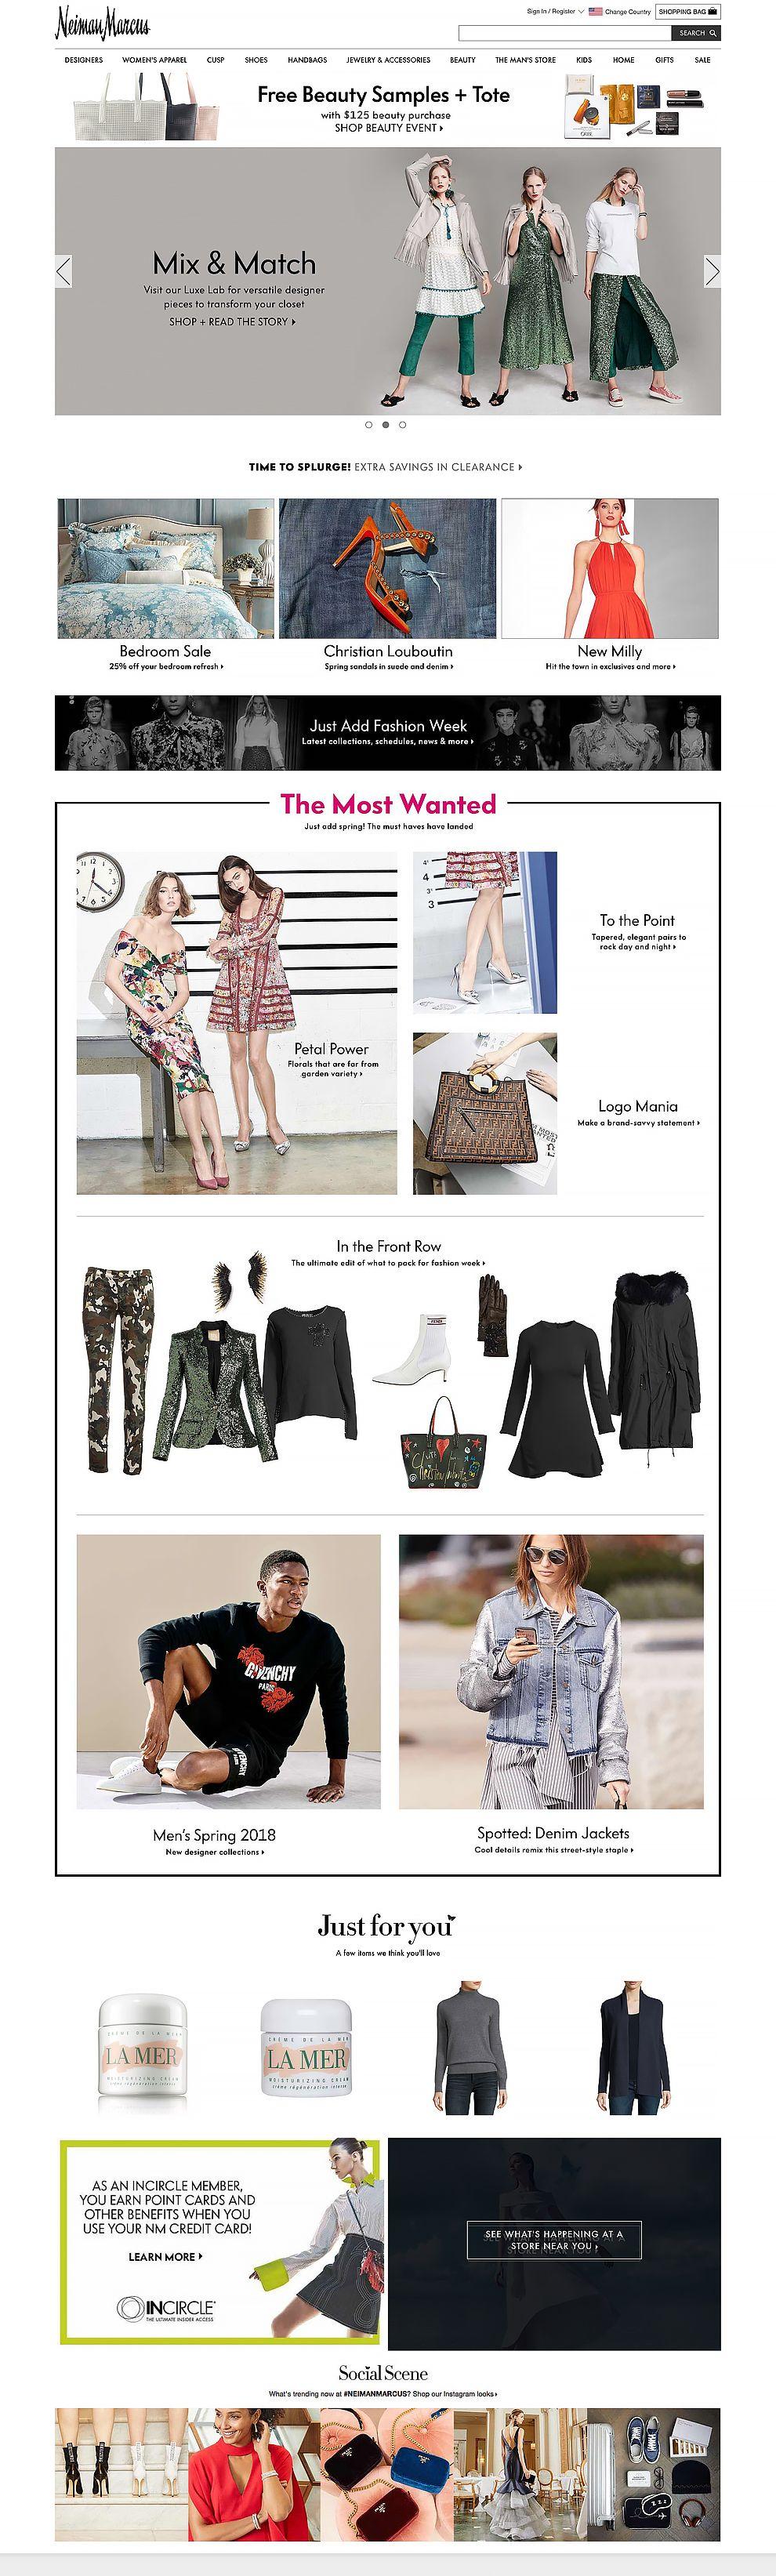 Neiman Marcus Luxury Website Homepage